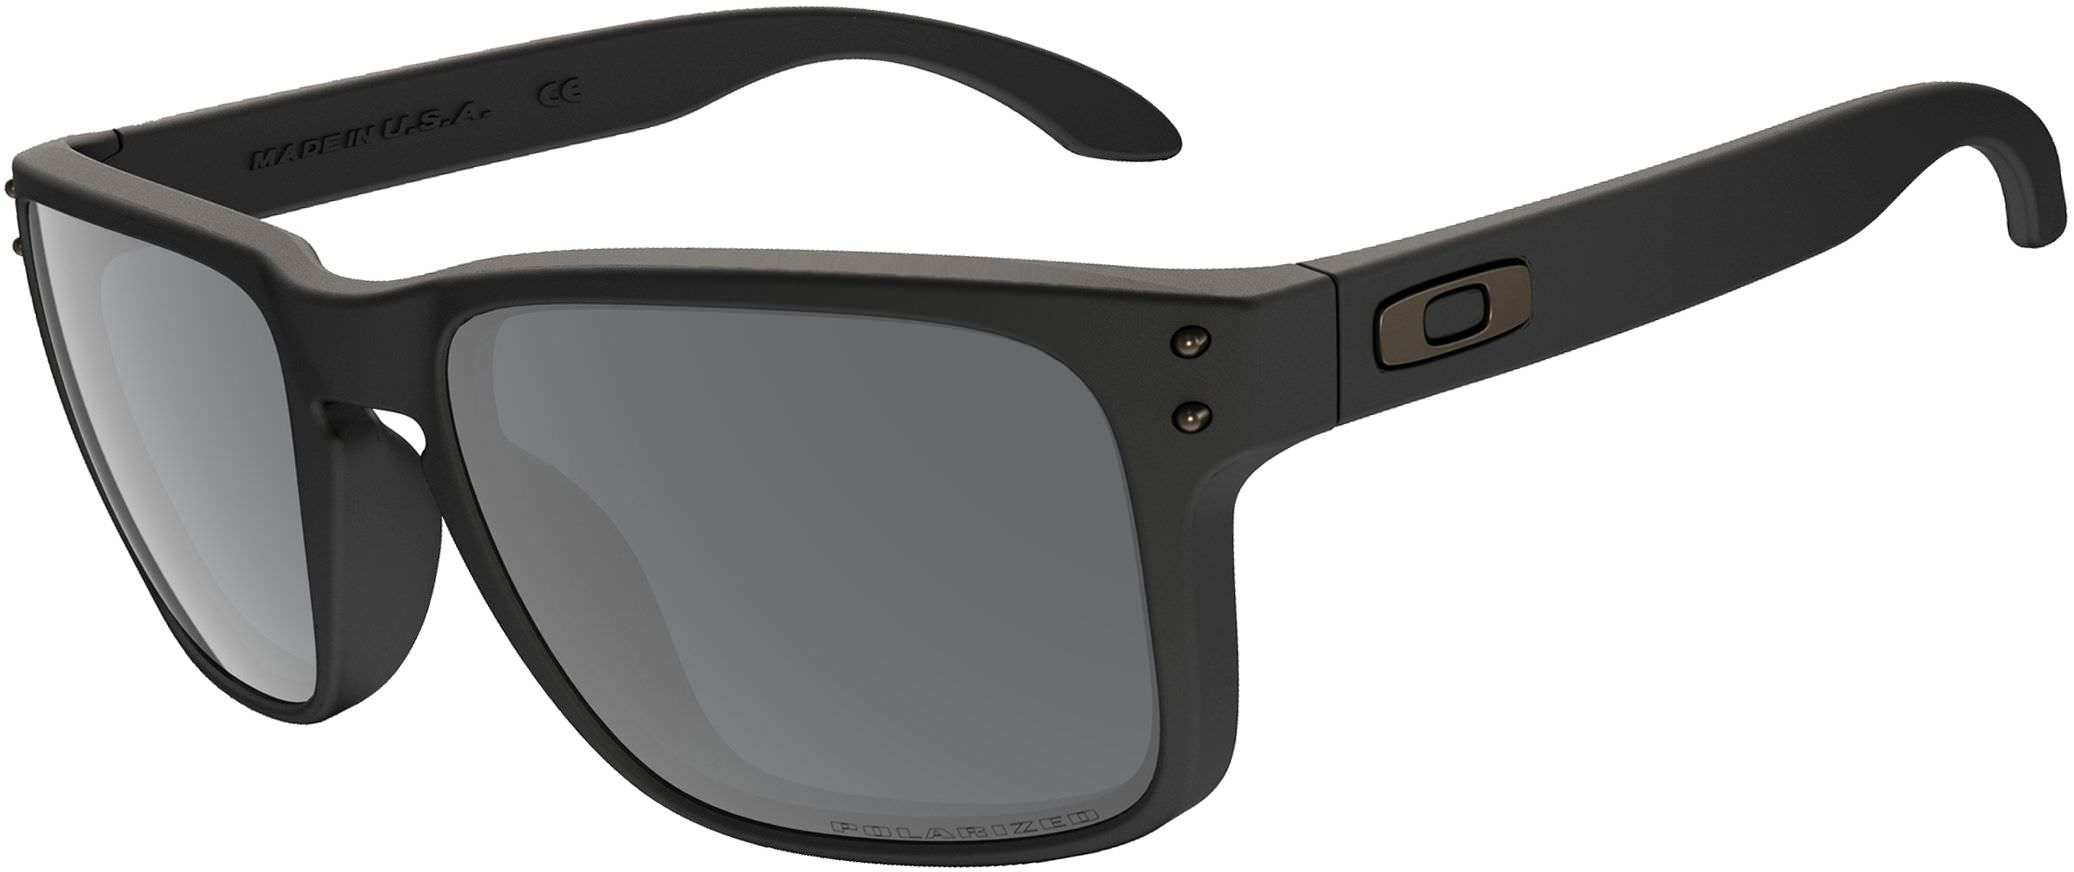 45dda74e1a ... Очки солнцезащитные Oakley 2018 HOLBROOK MATTE BLACKBLACK IRIDIUM on  feet shots of af8cf 69fbf  Sentinel Oakley Sunglasses ...